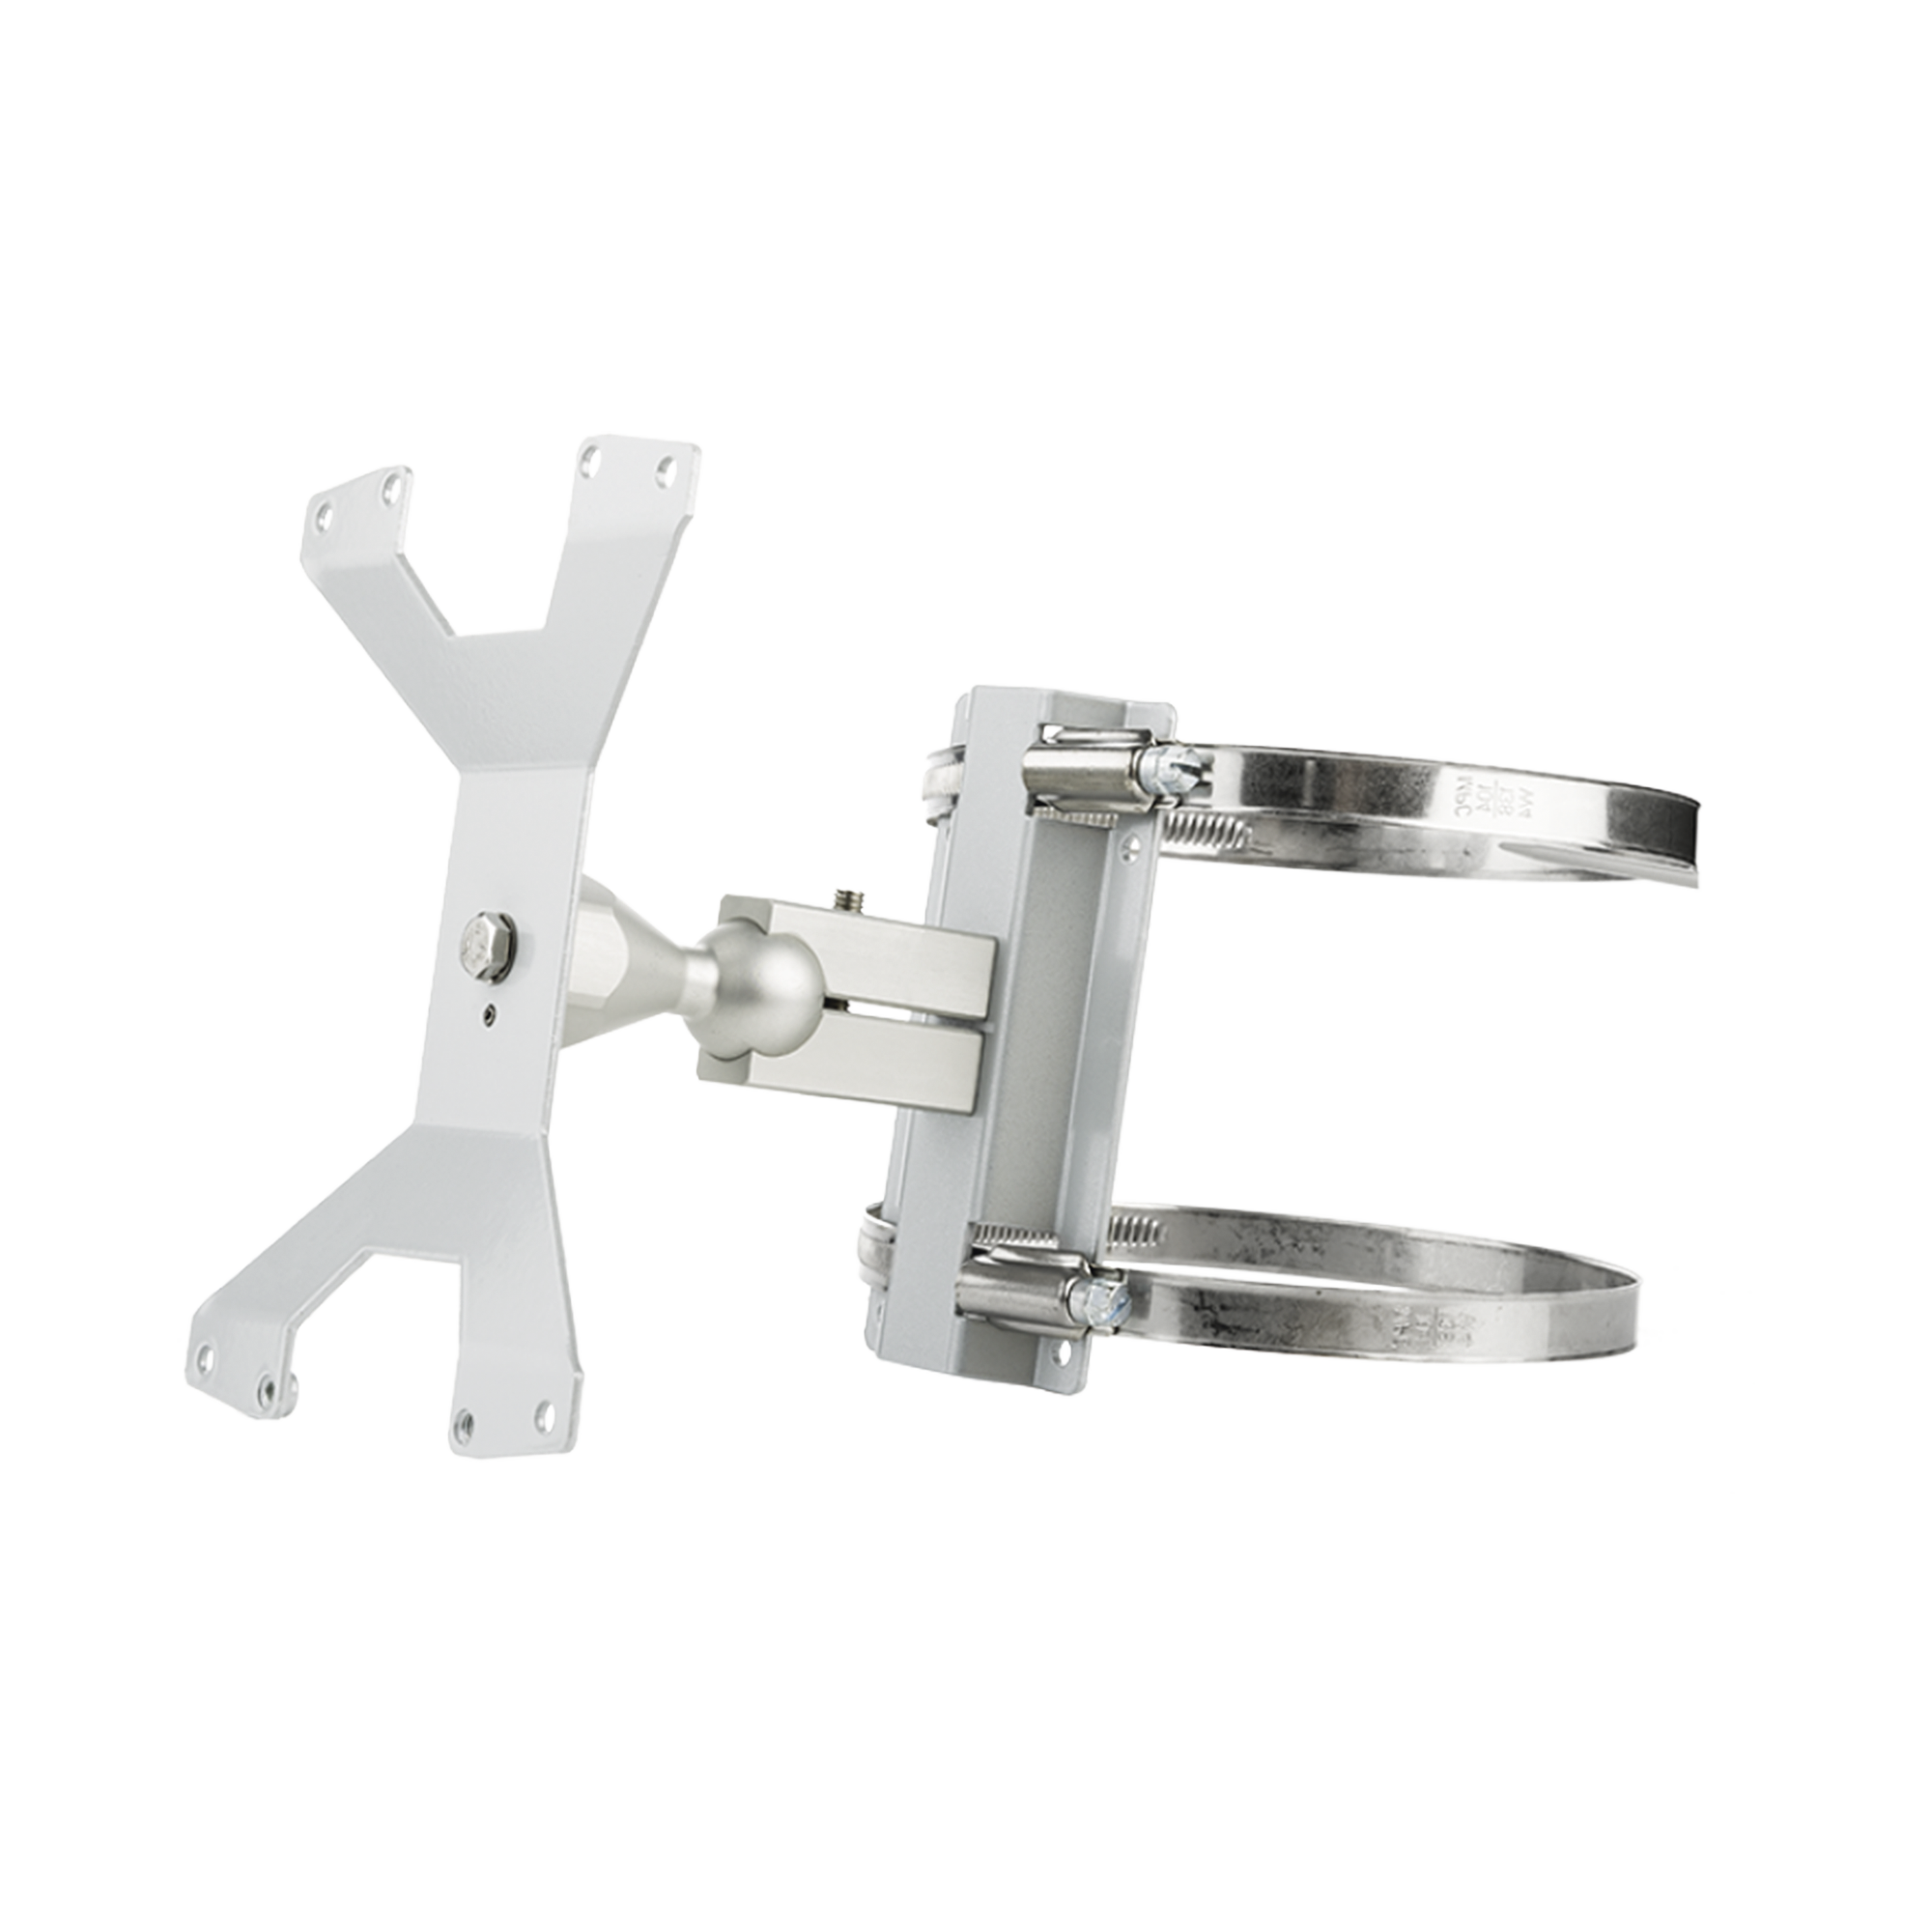 kit de montaje en poste, compatible con lectores Upass o TRANSIT Entry